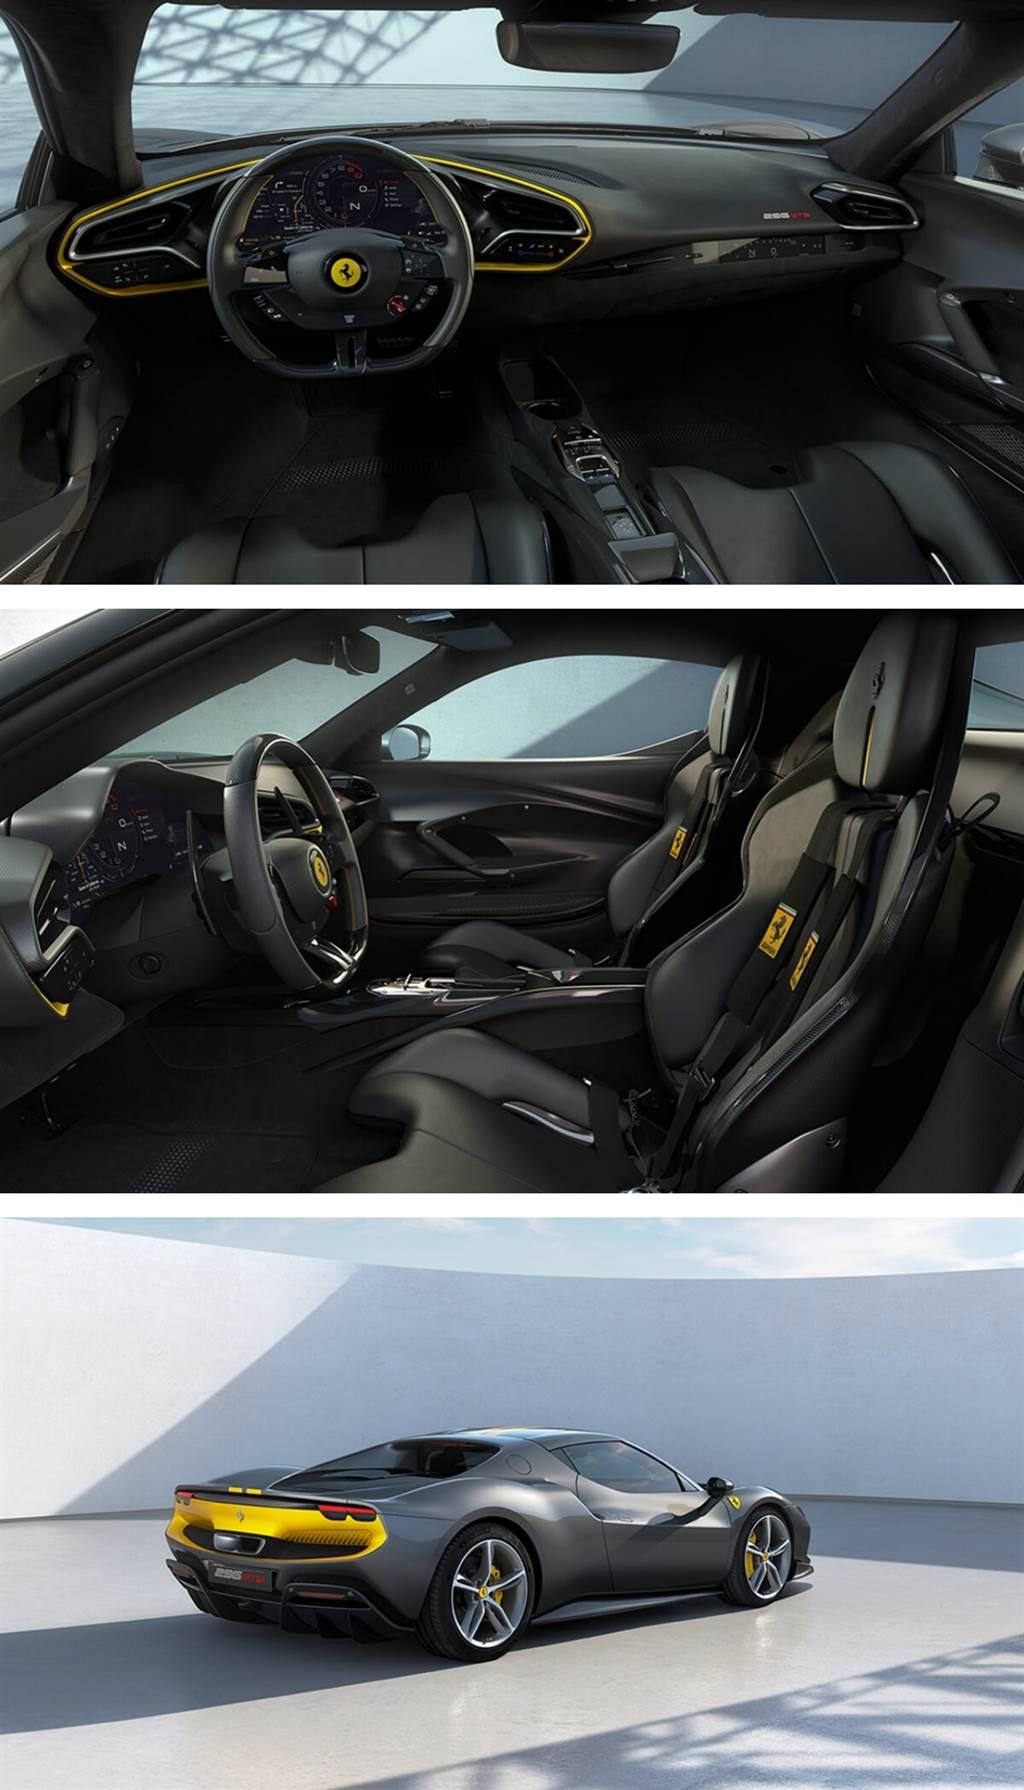 296 GTB的Assetto Fiorano版本靈感源自250 LM,在前保險桿的外邊緣採用了額外的碳纖維元素,並在內部配備了輕質碳纖維組件。